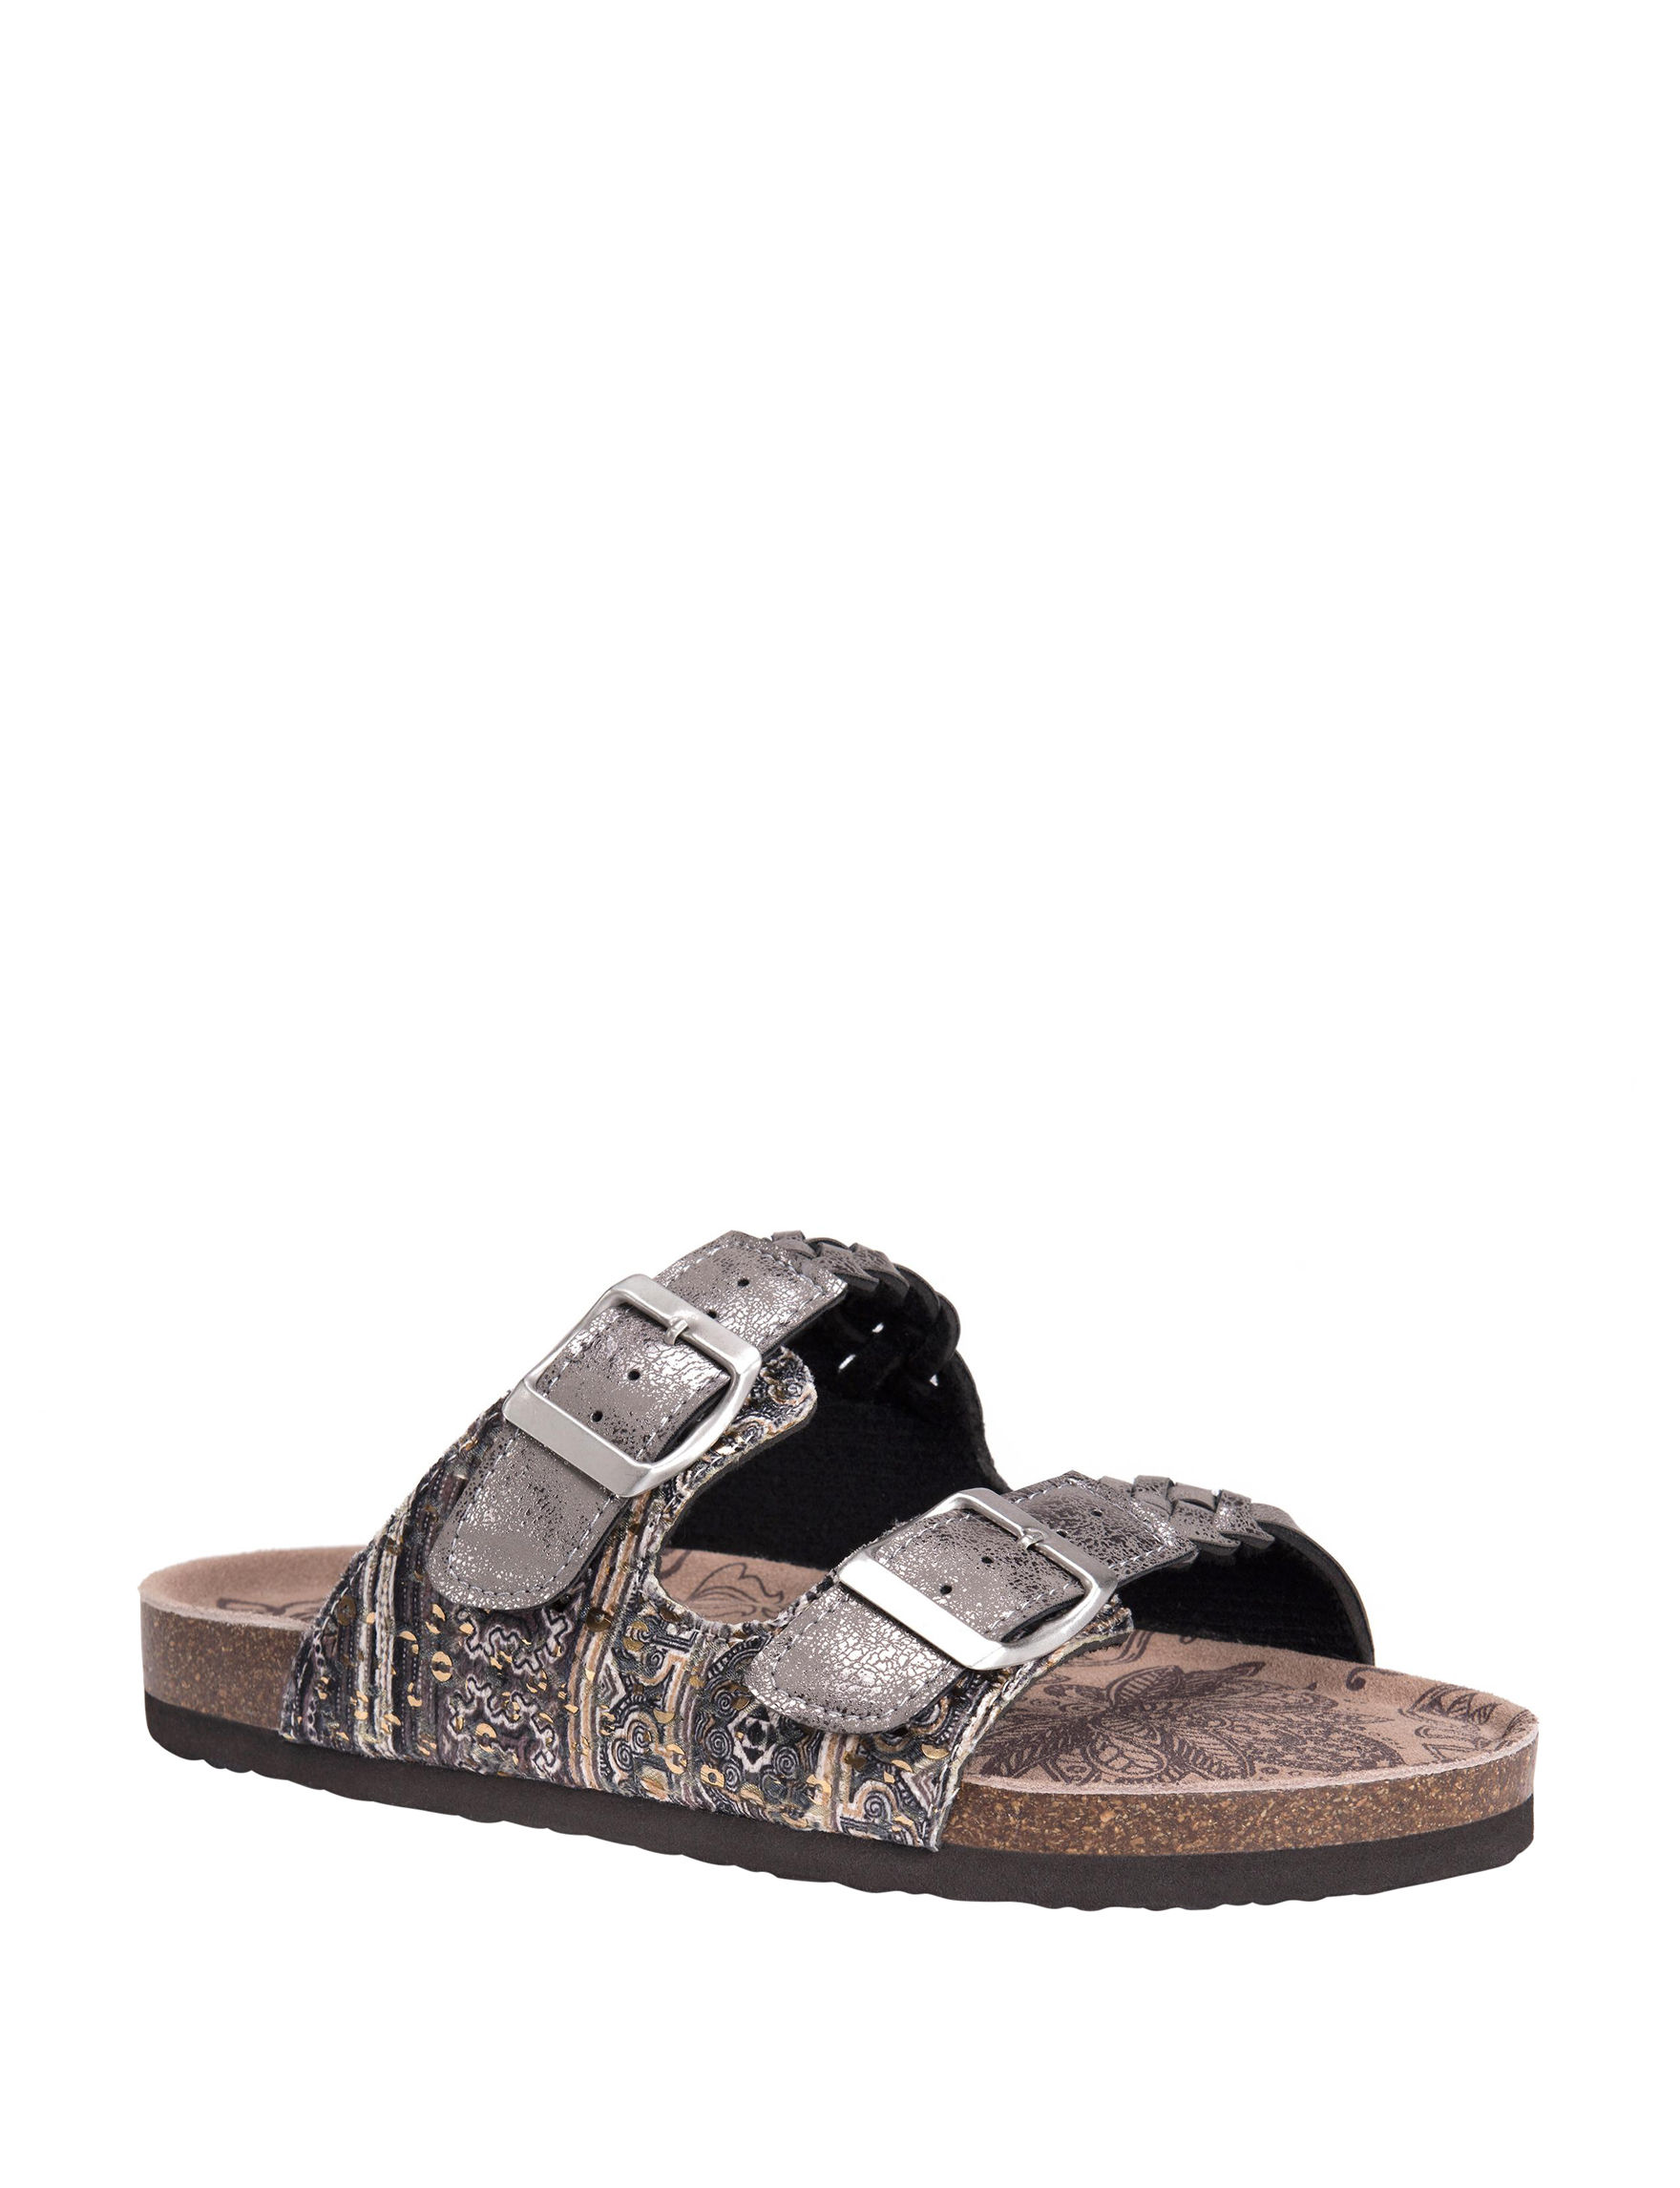 Muk Luks Silver Flat Sandals